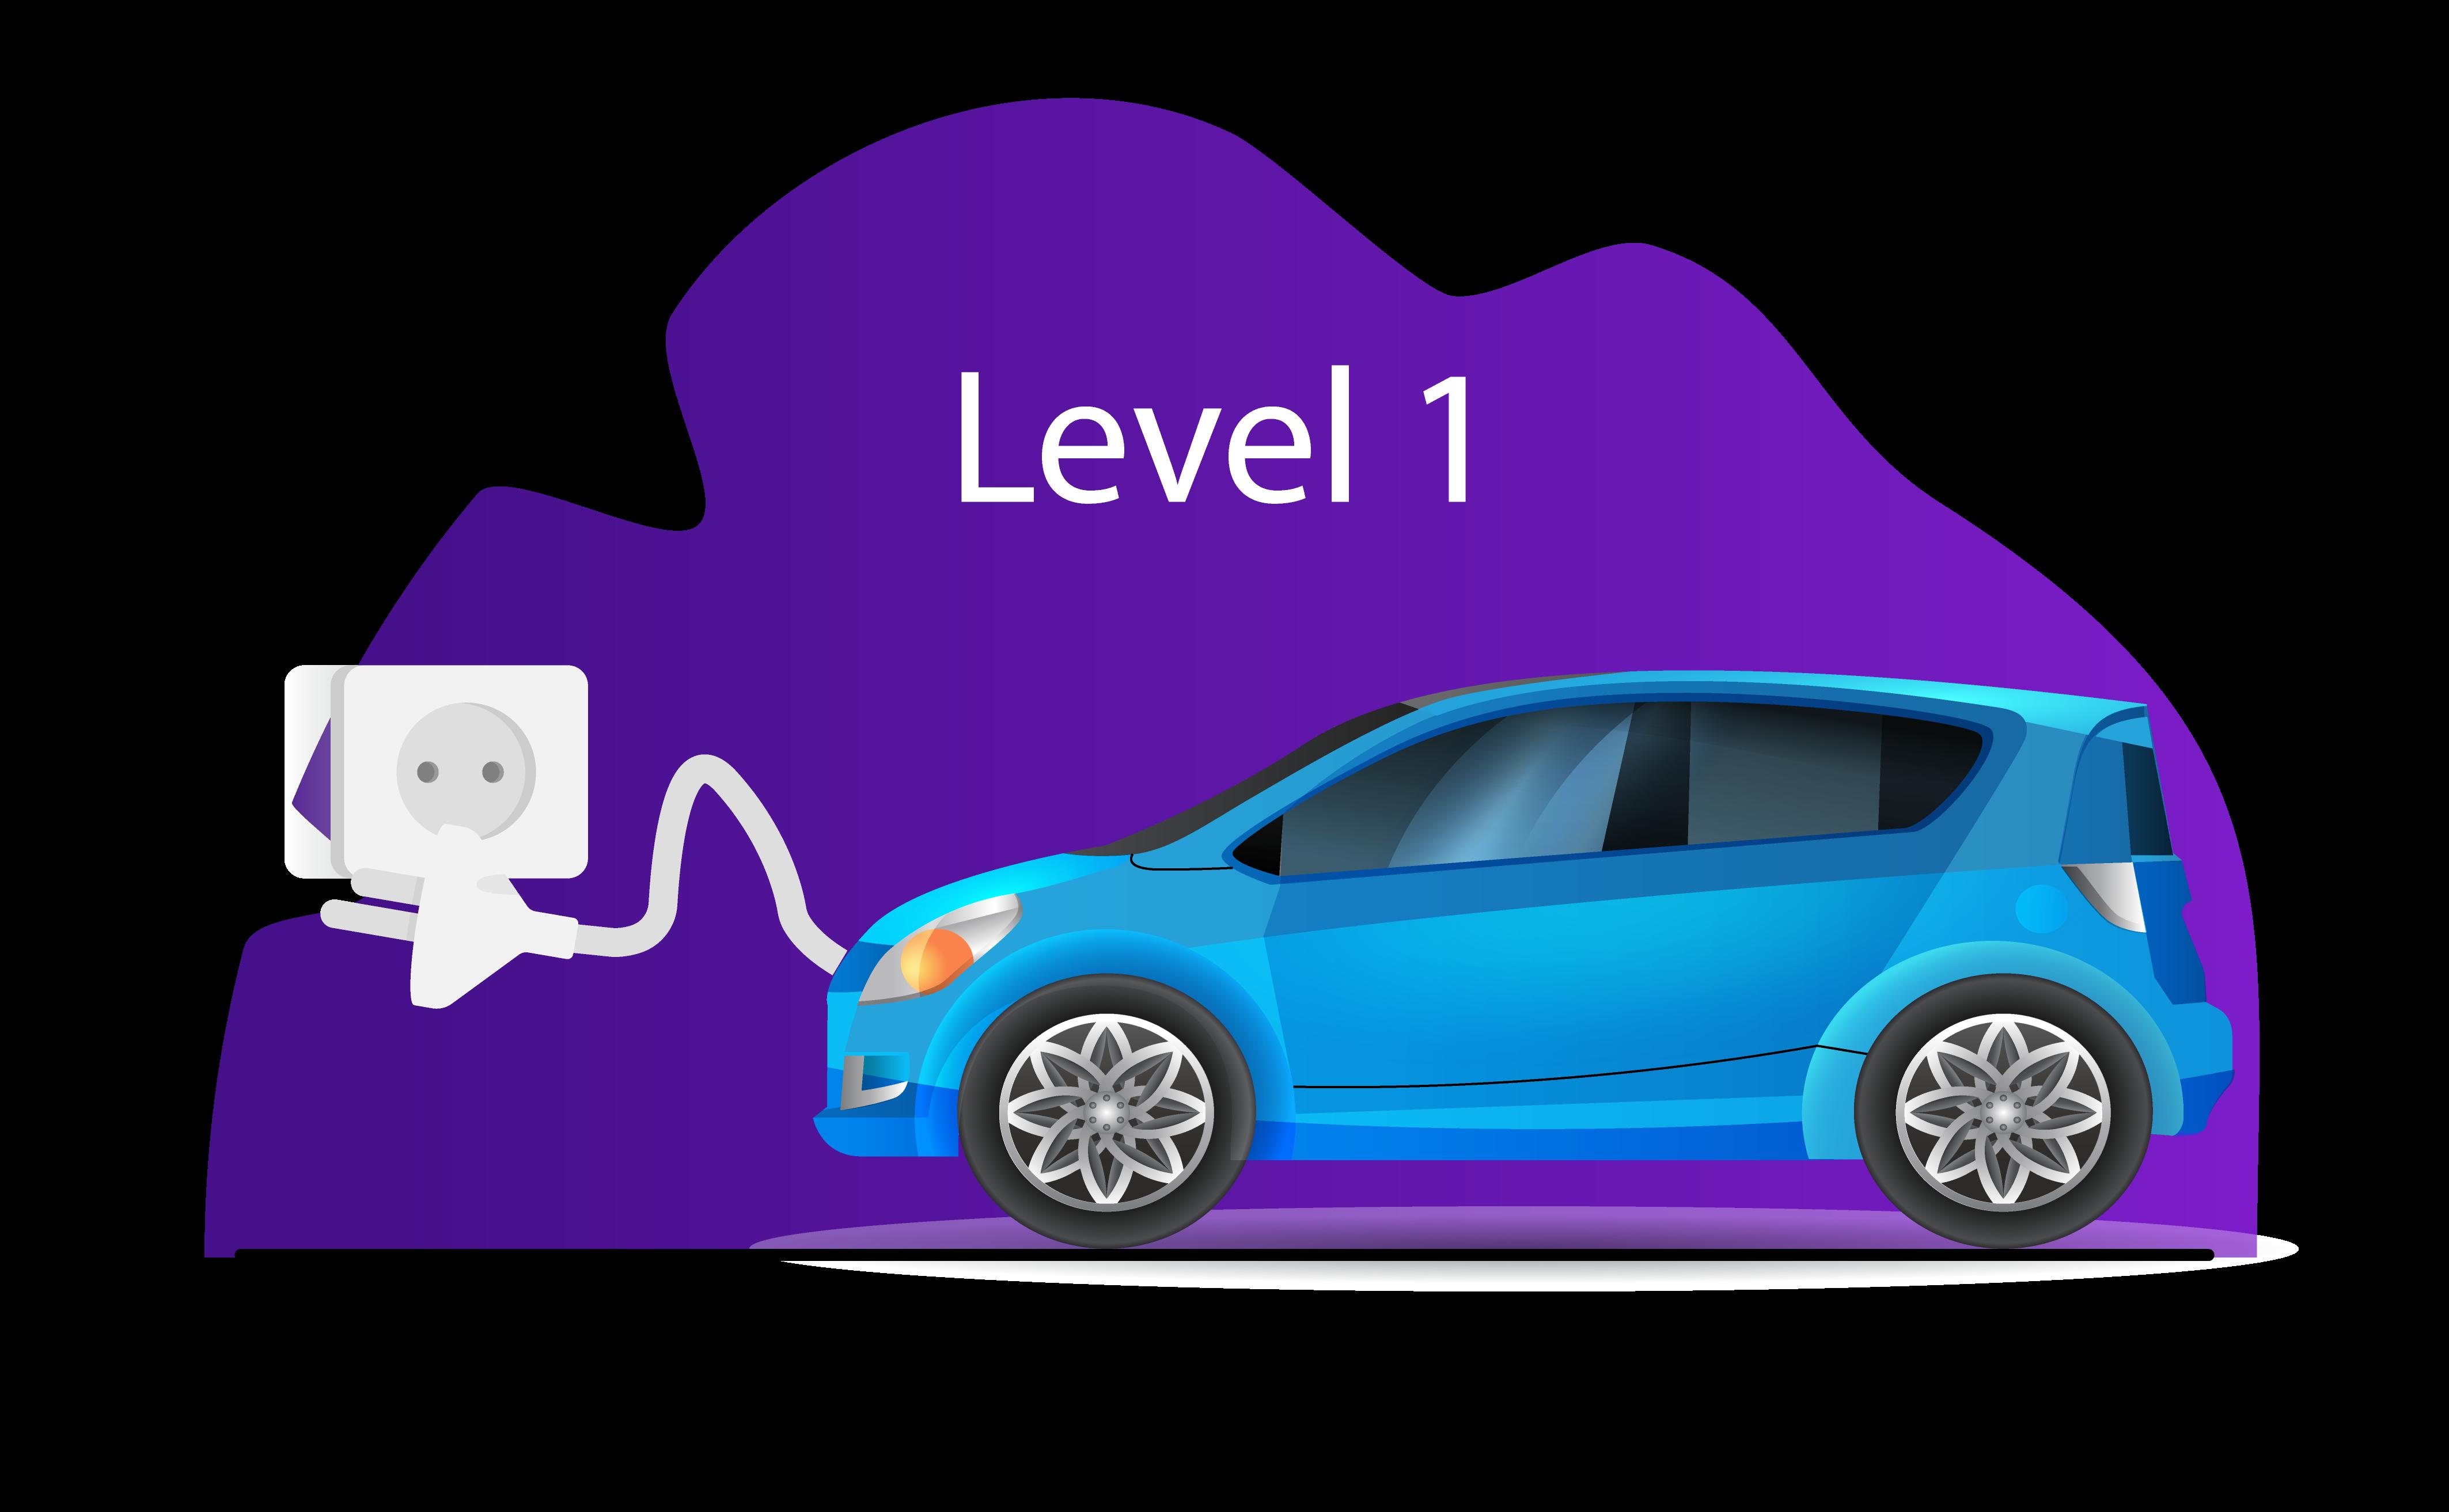 Level 1 charging EV